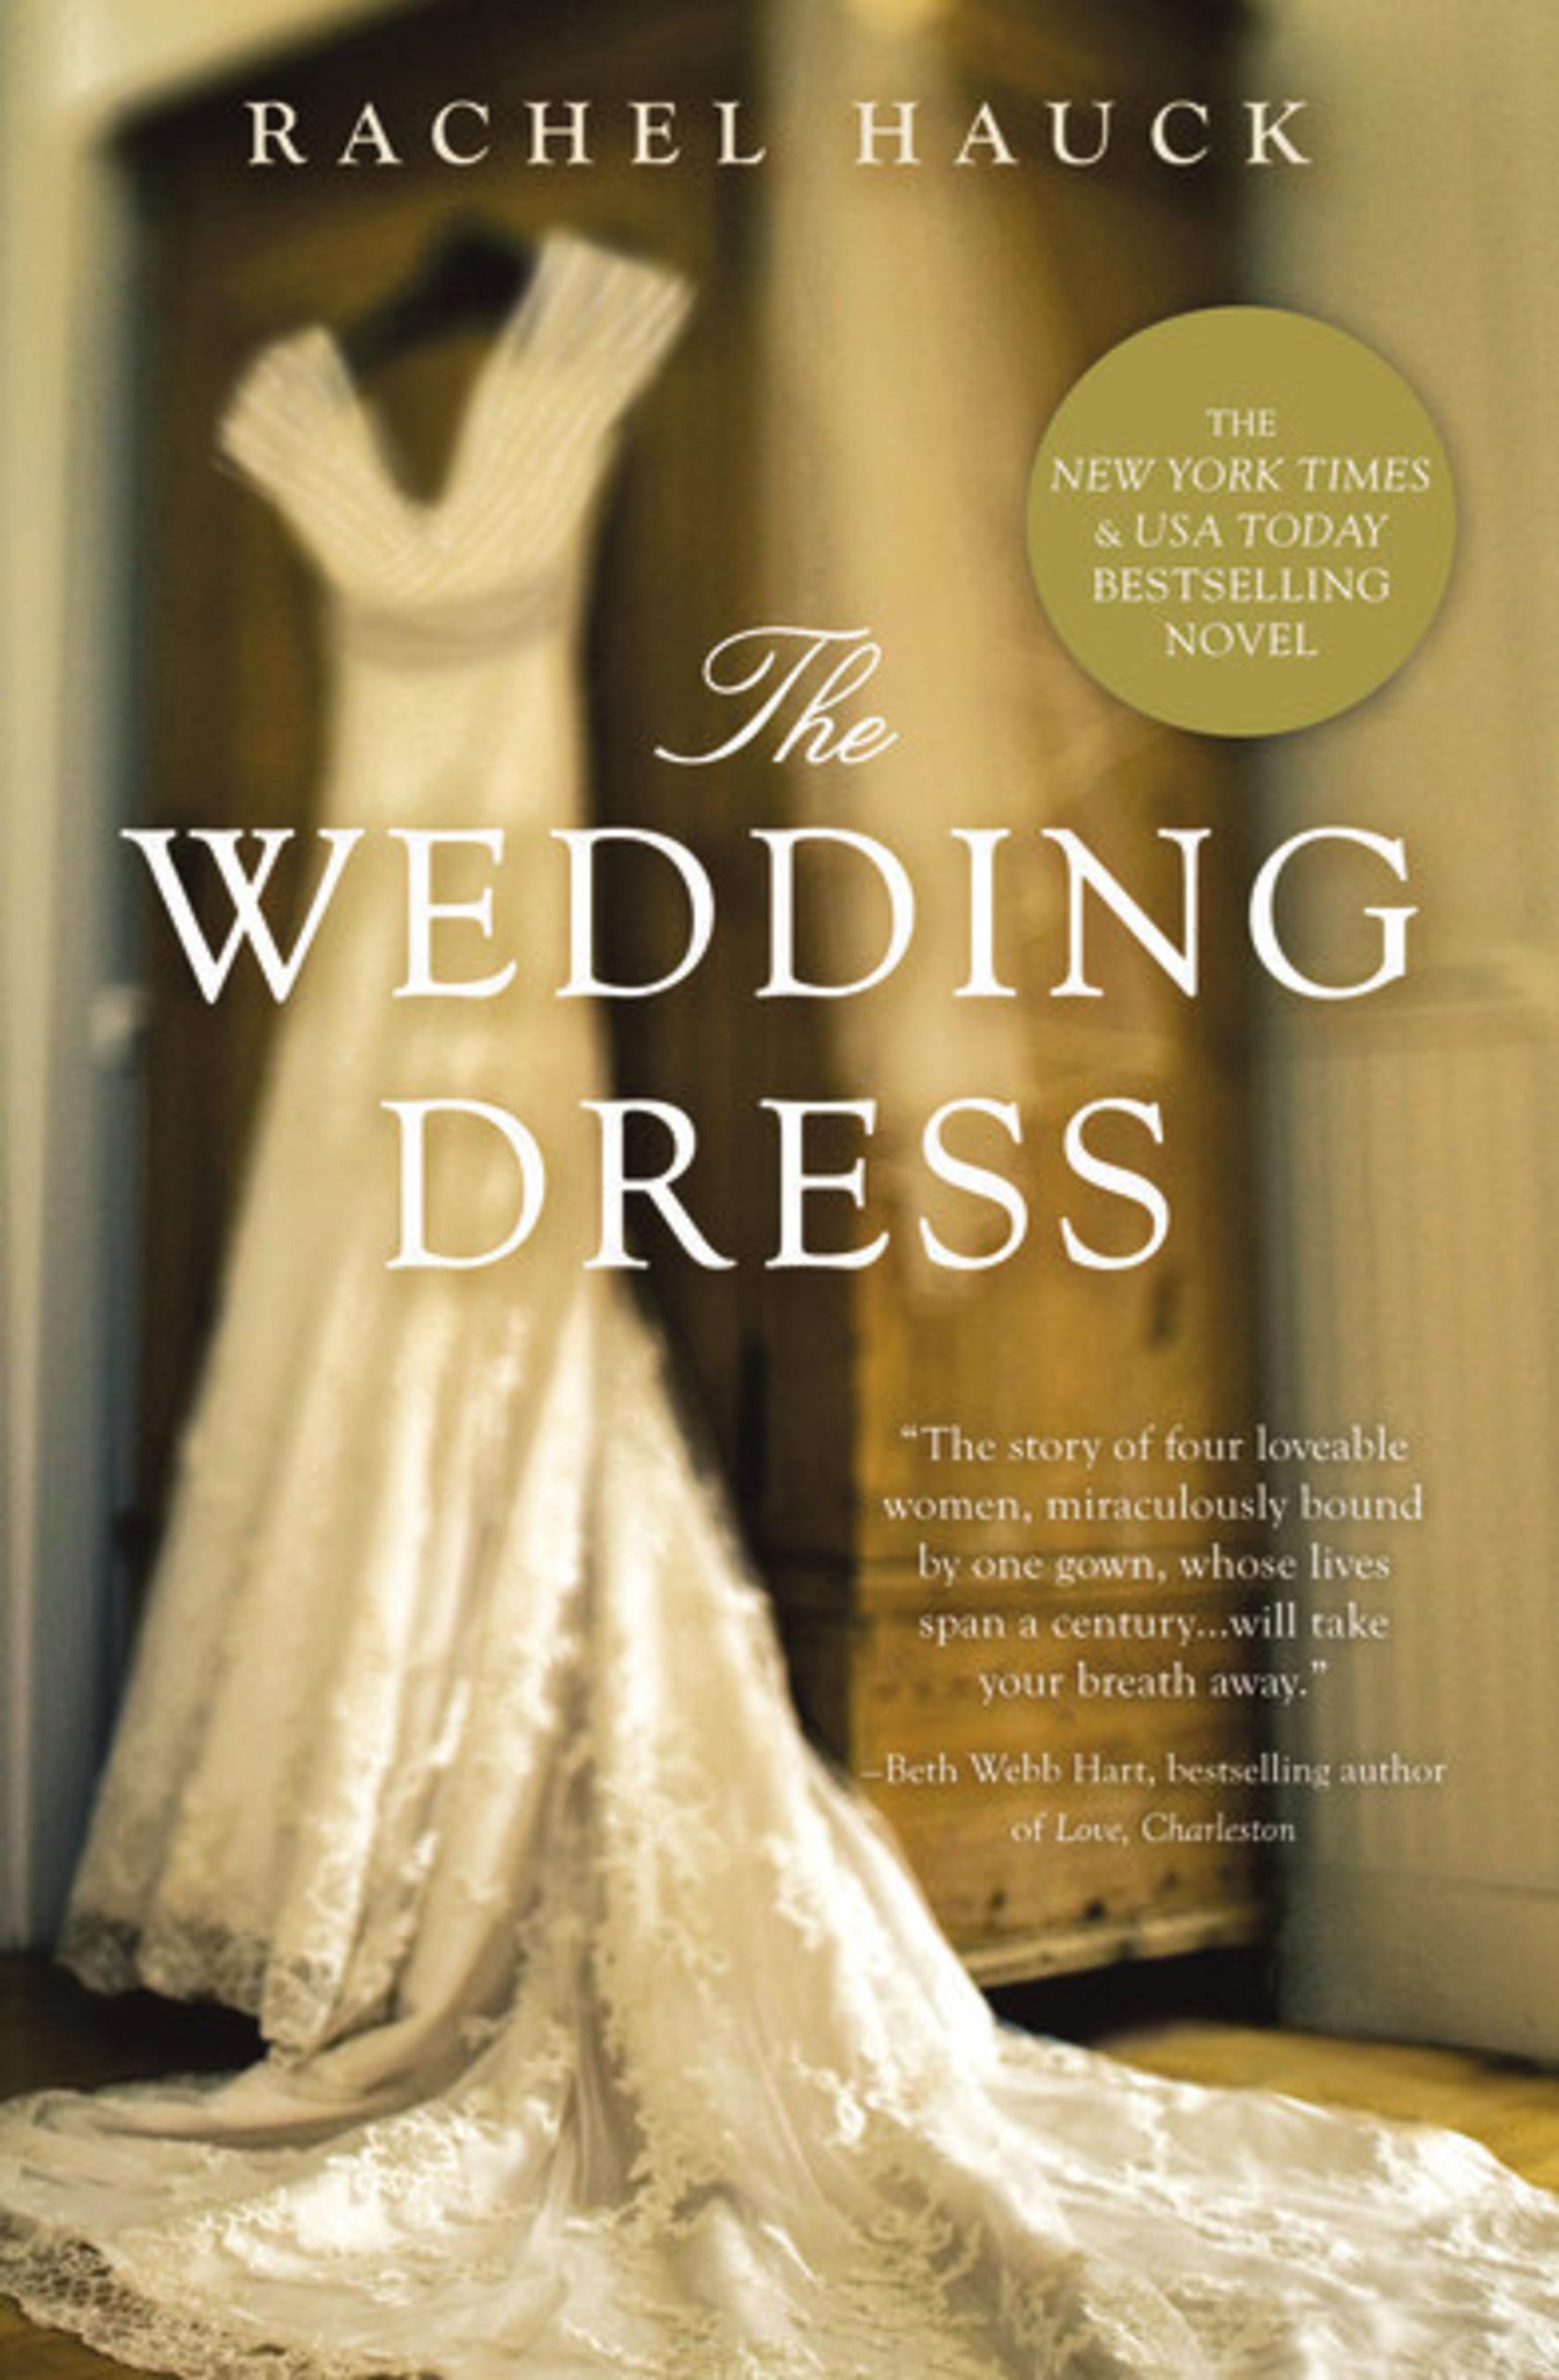 The Wedding Dress surpasses 100,000 e-books sold